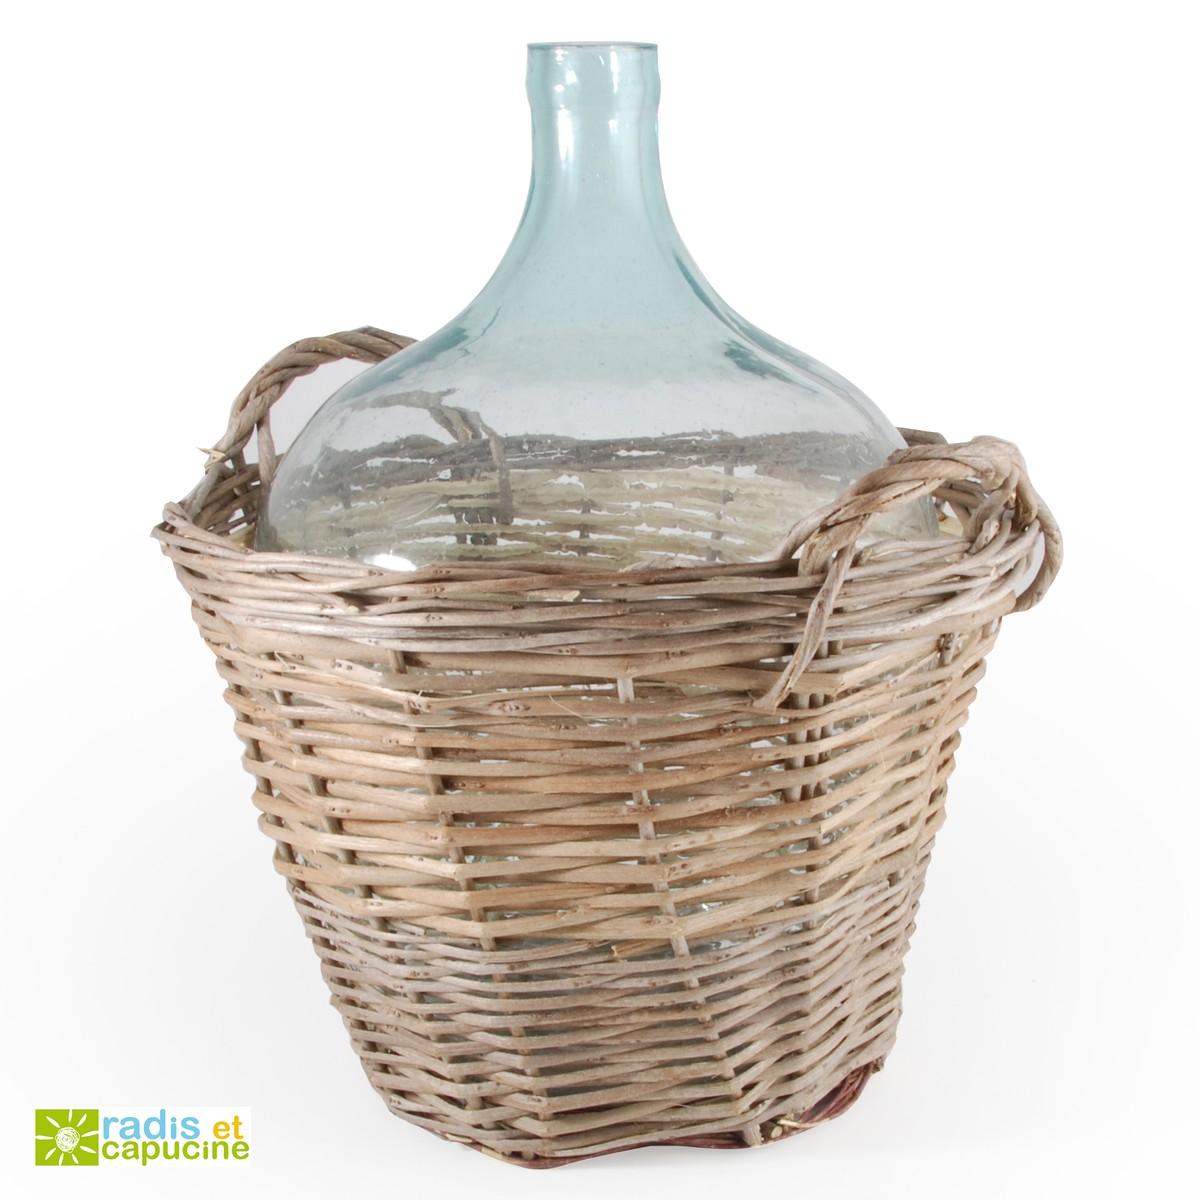 dame jeanne en verre great collecteur eau cuve damejeanne en verre litres avec goulot large. Black Bedroom Furniture Sets. Home Design Ideas